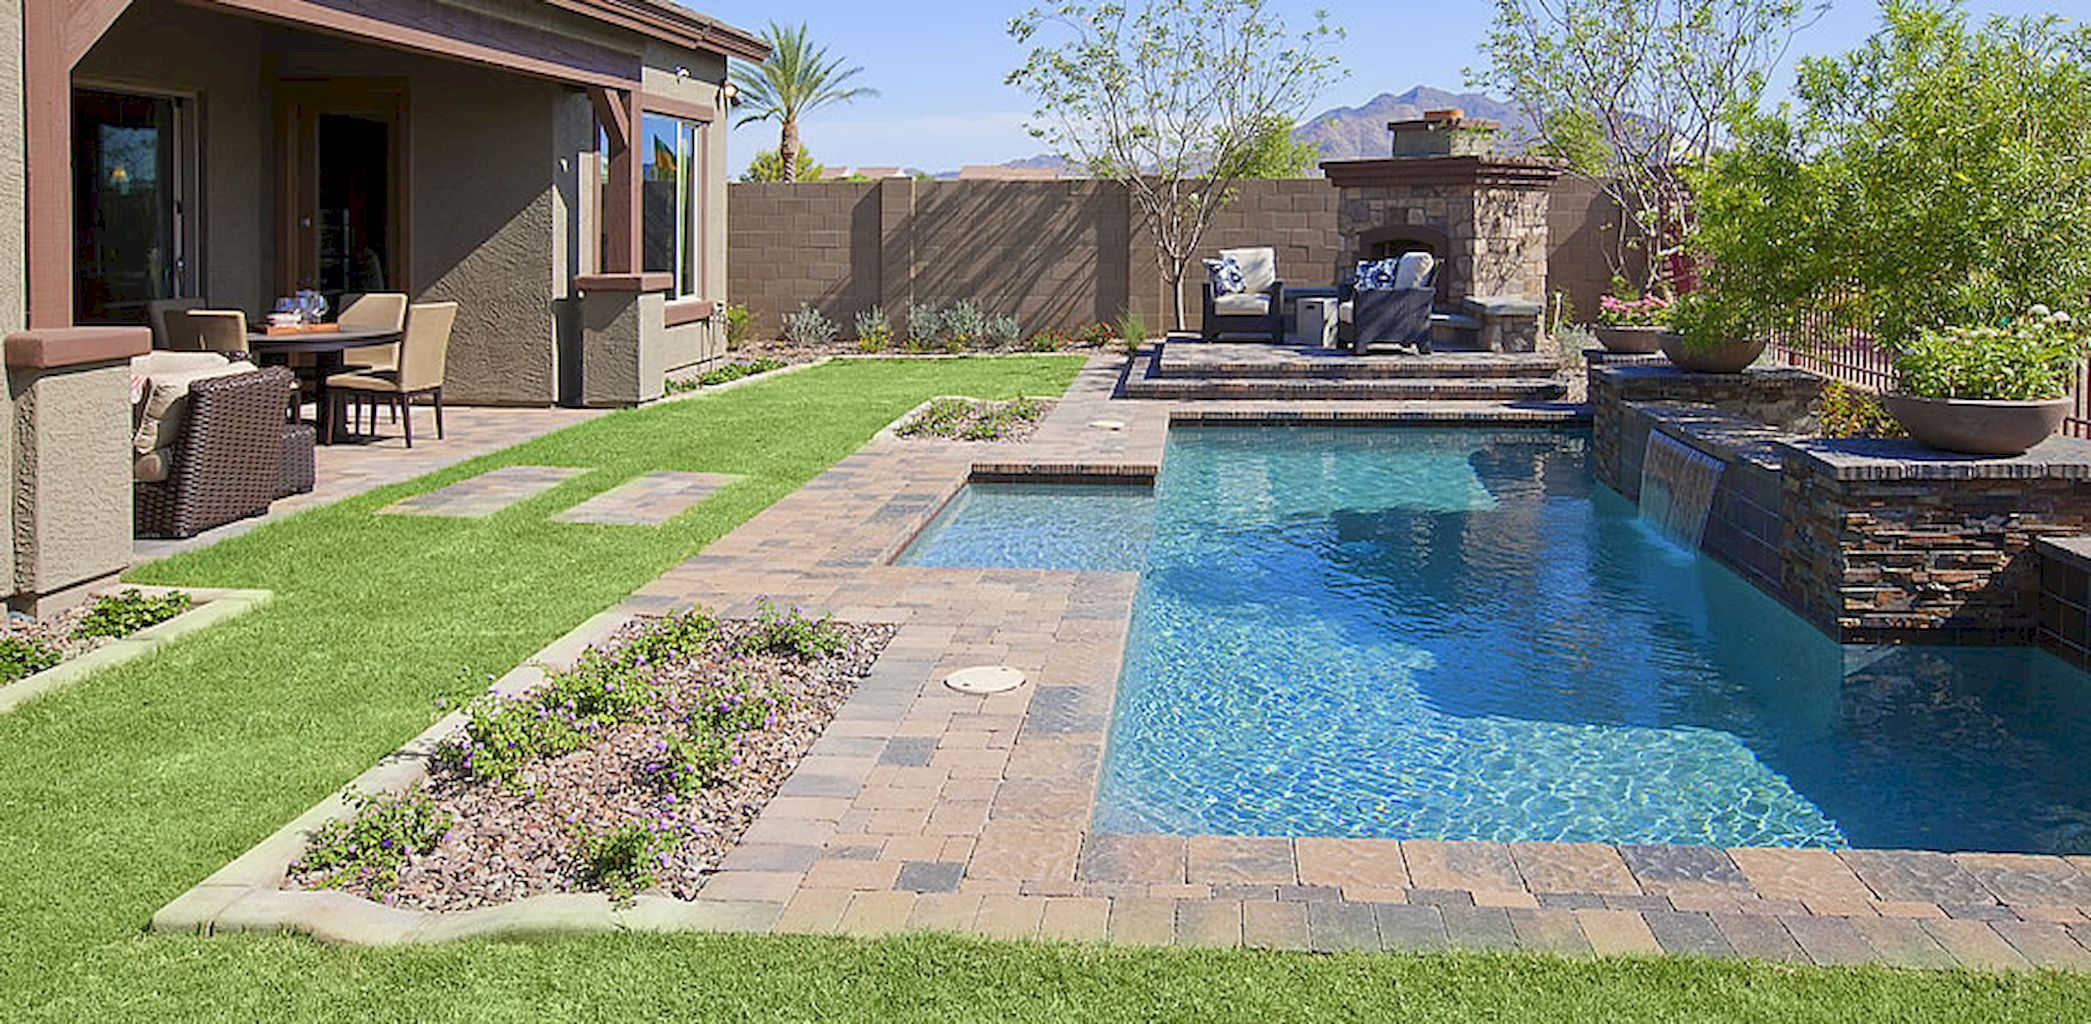 Arizona Backyard Ideas With Pool